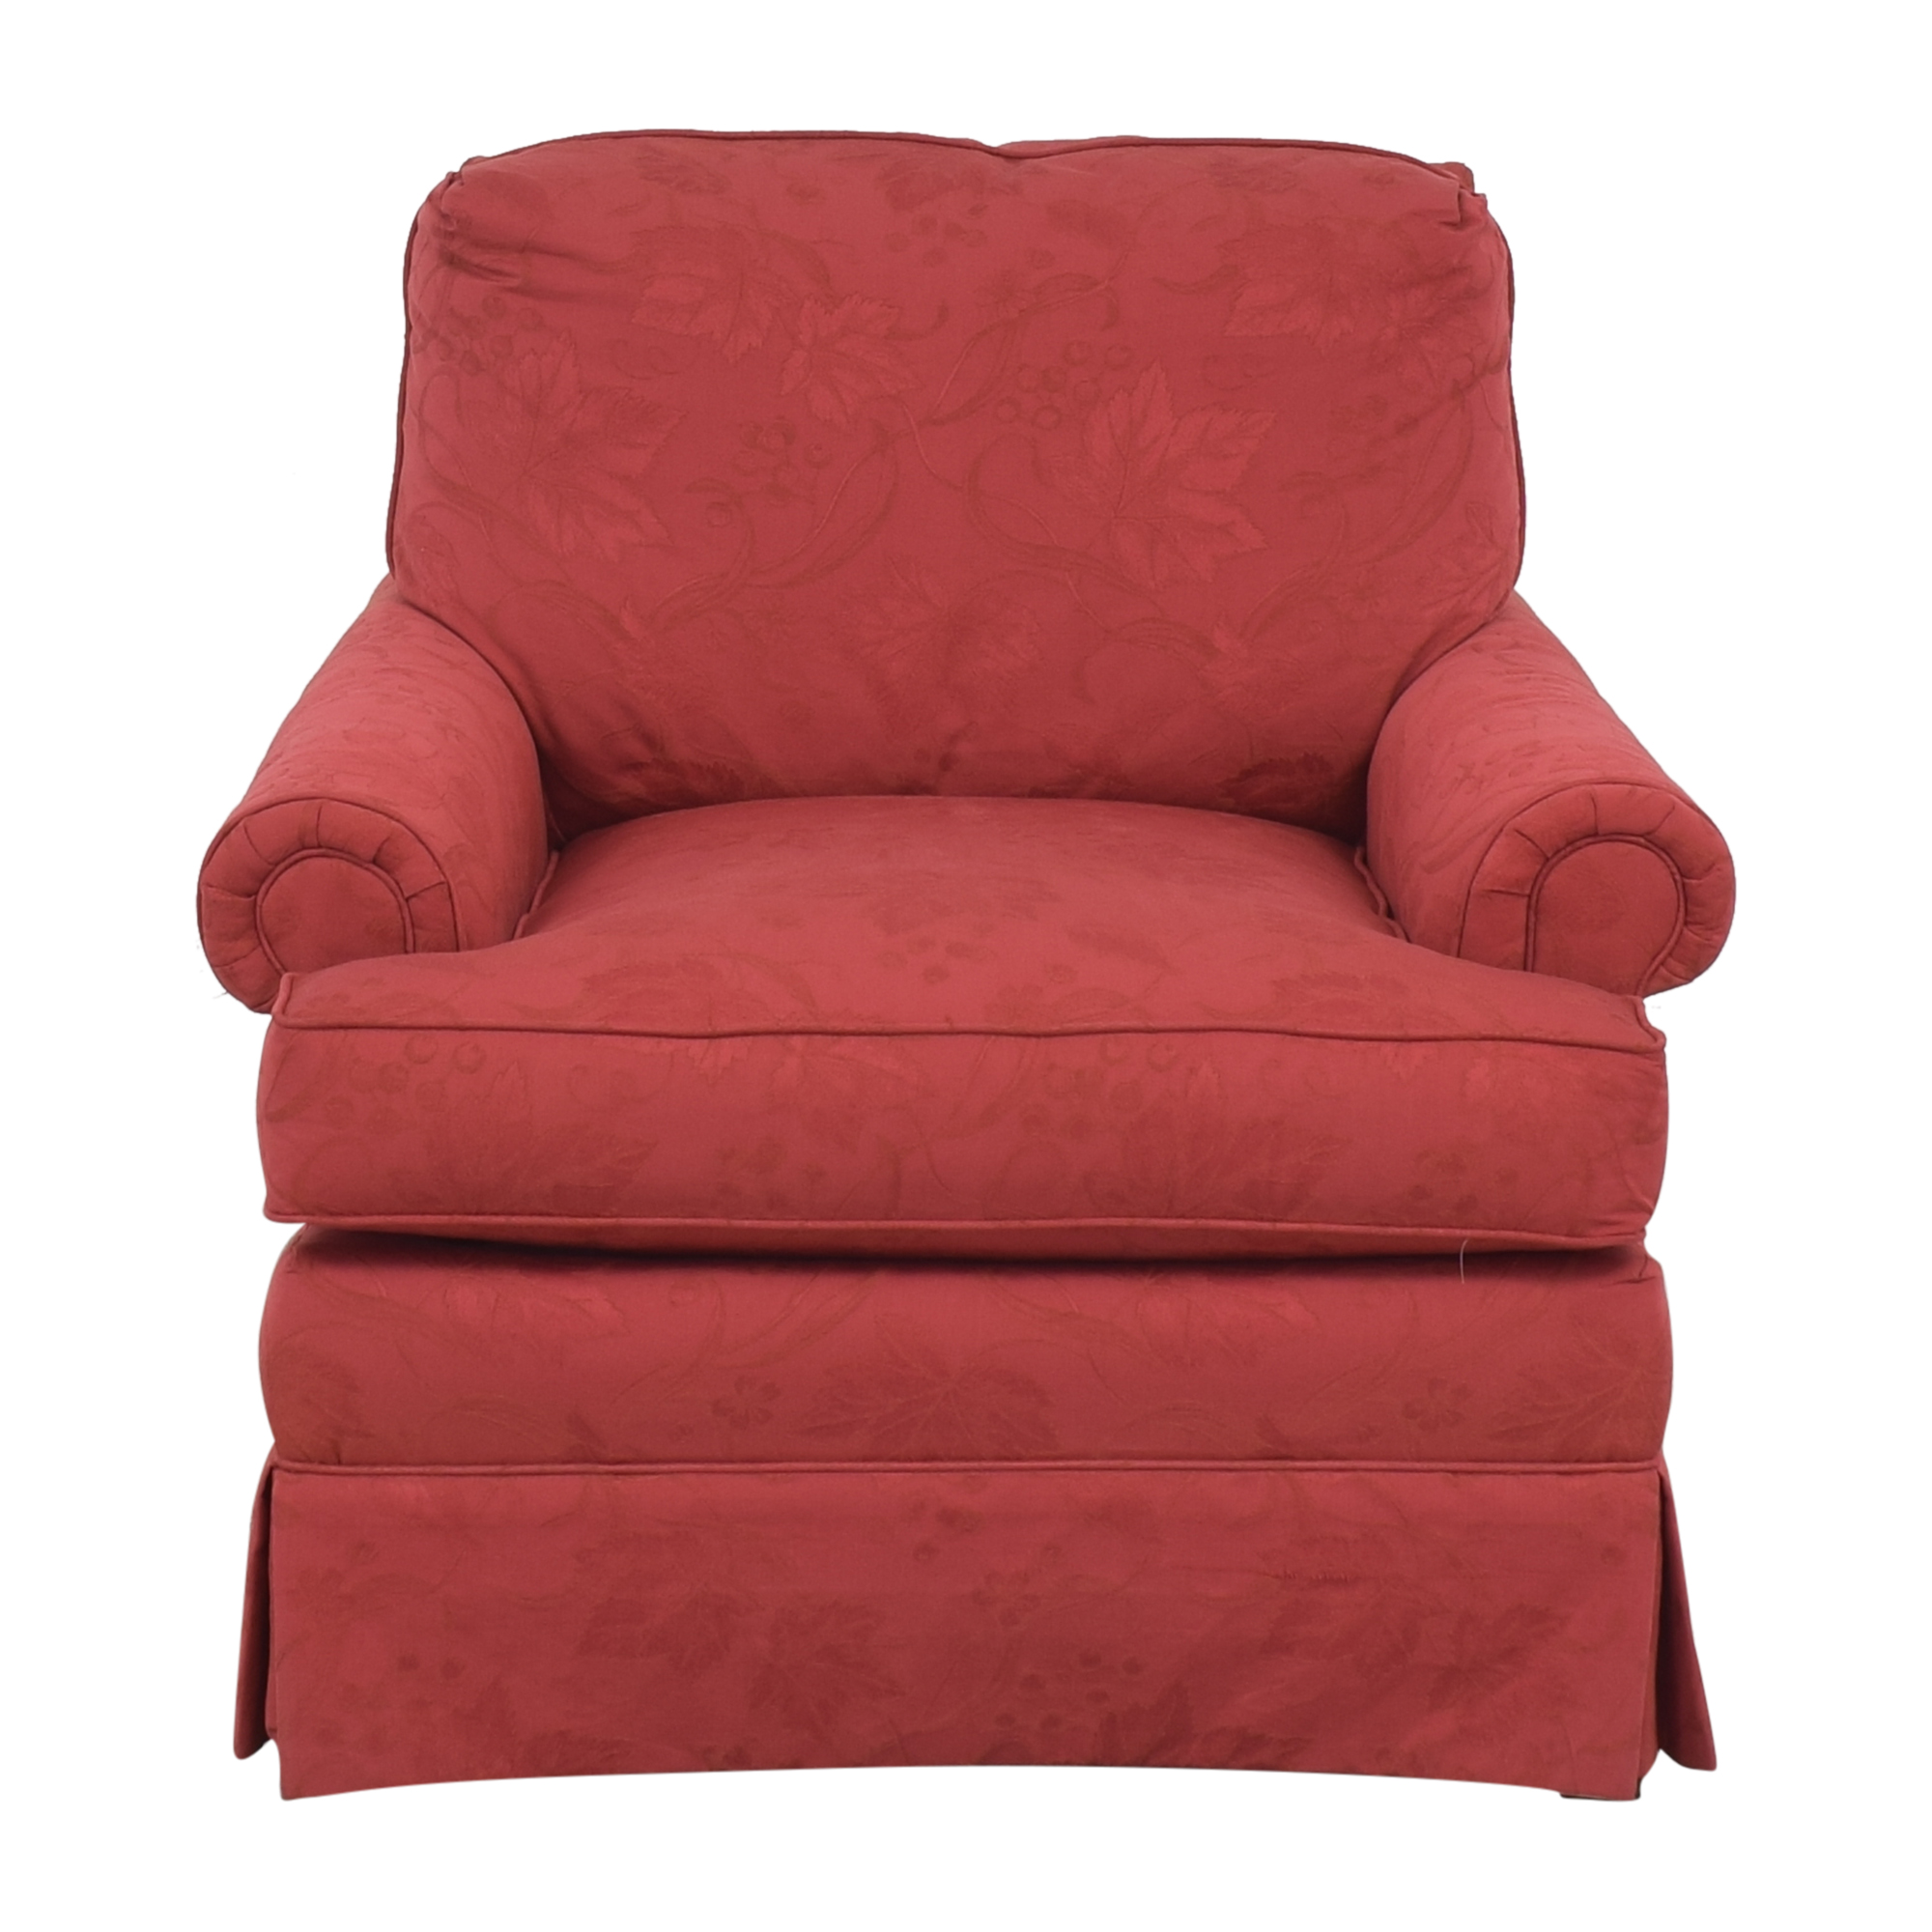 shop Harden Skirted Armchair Harden Accent Chairs